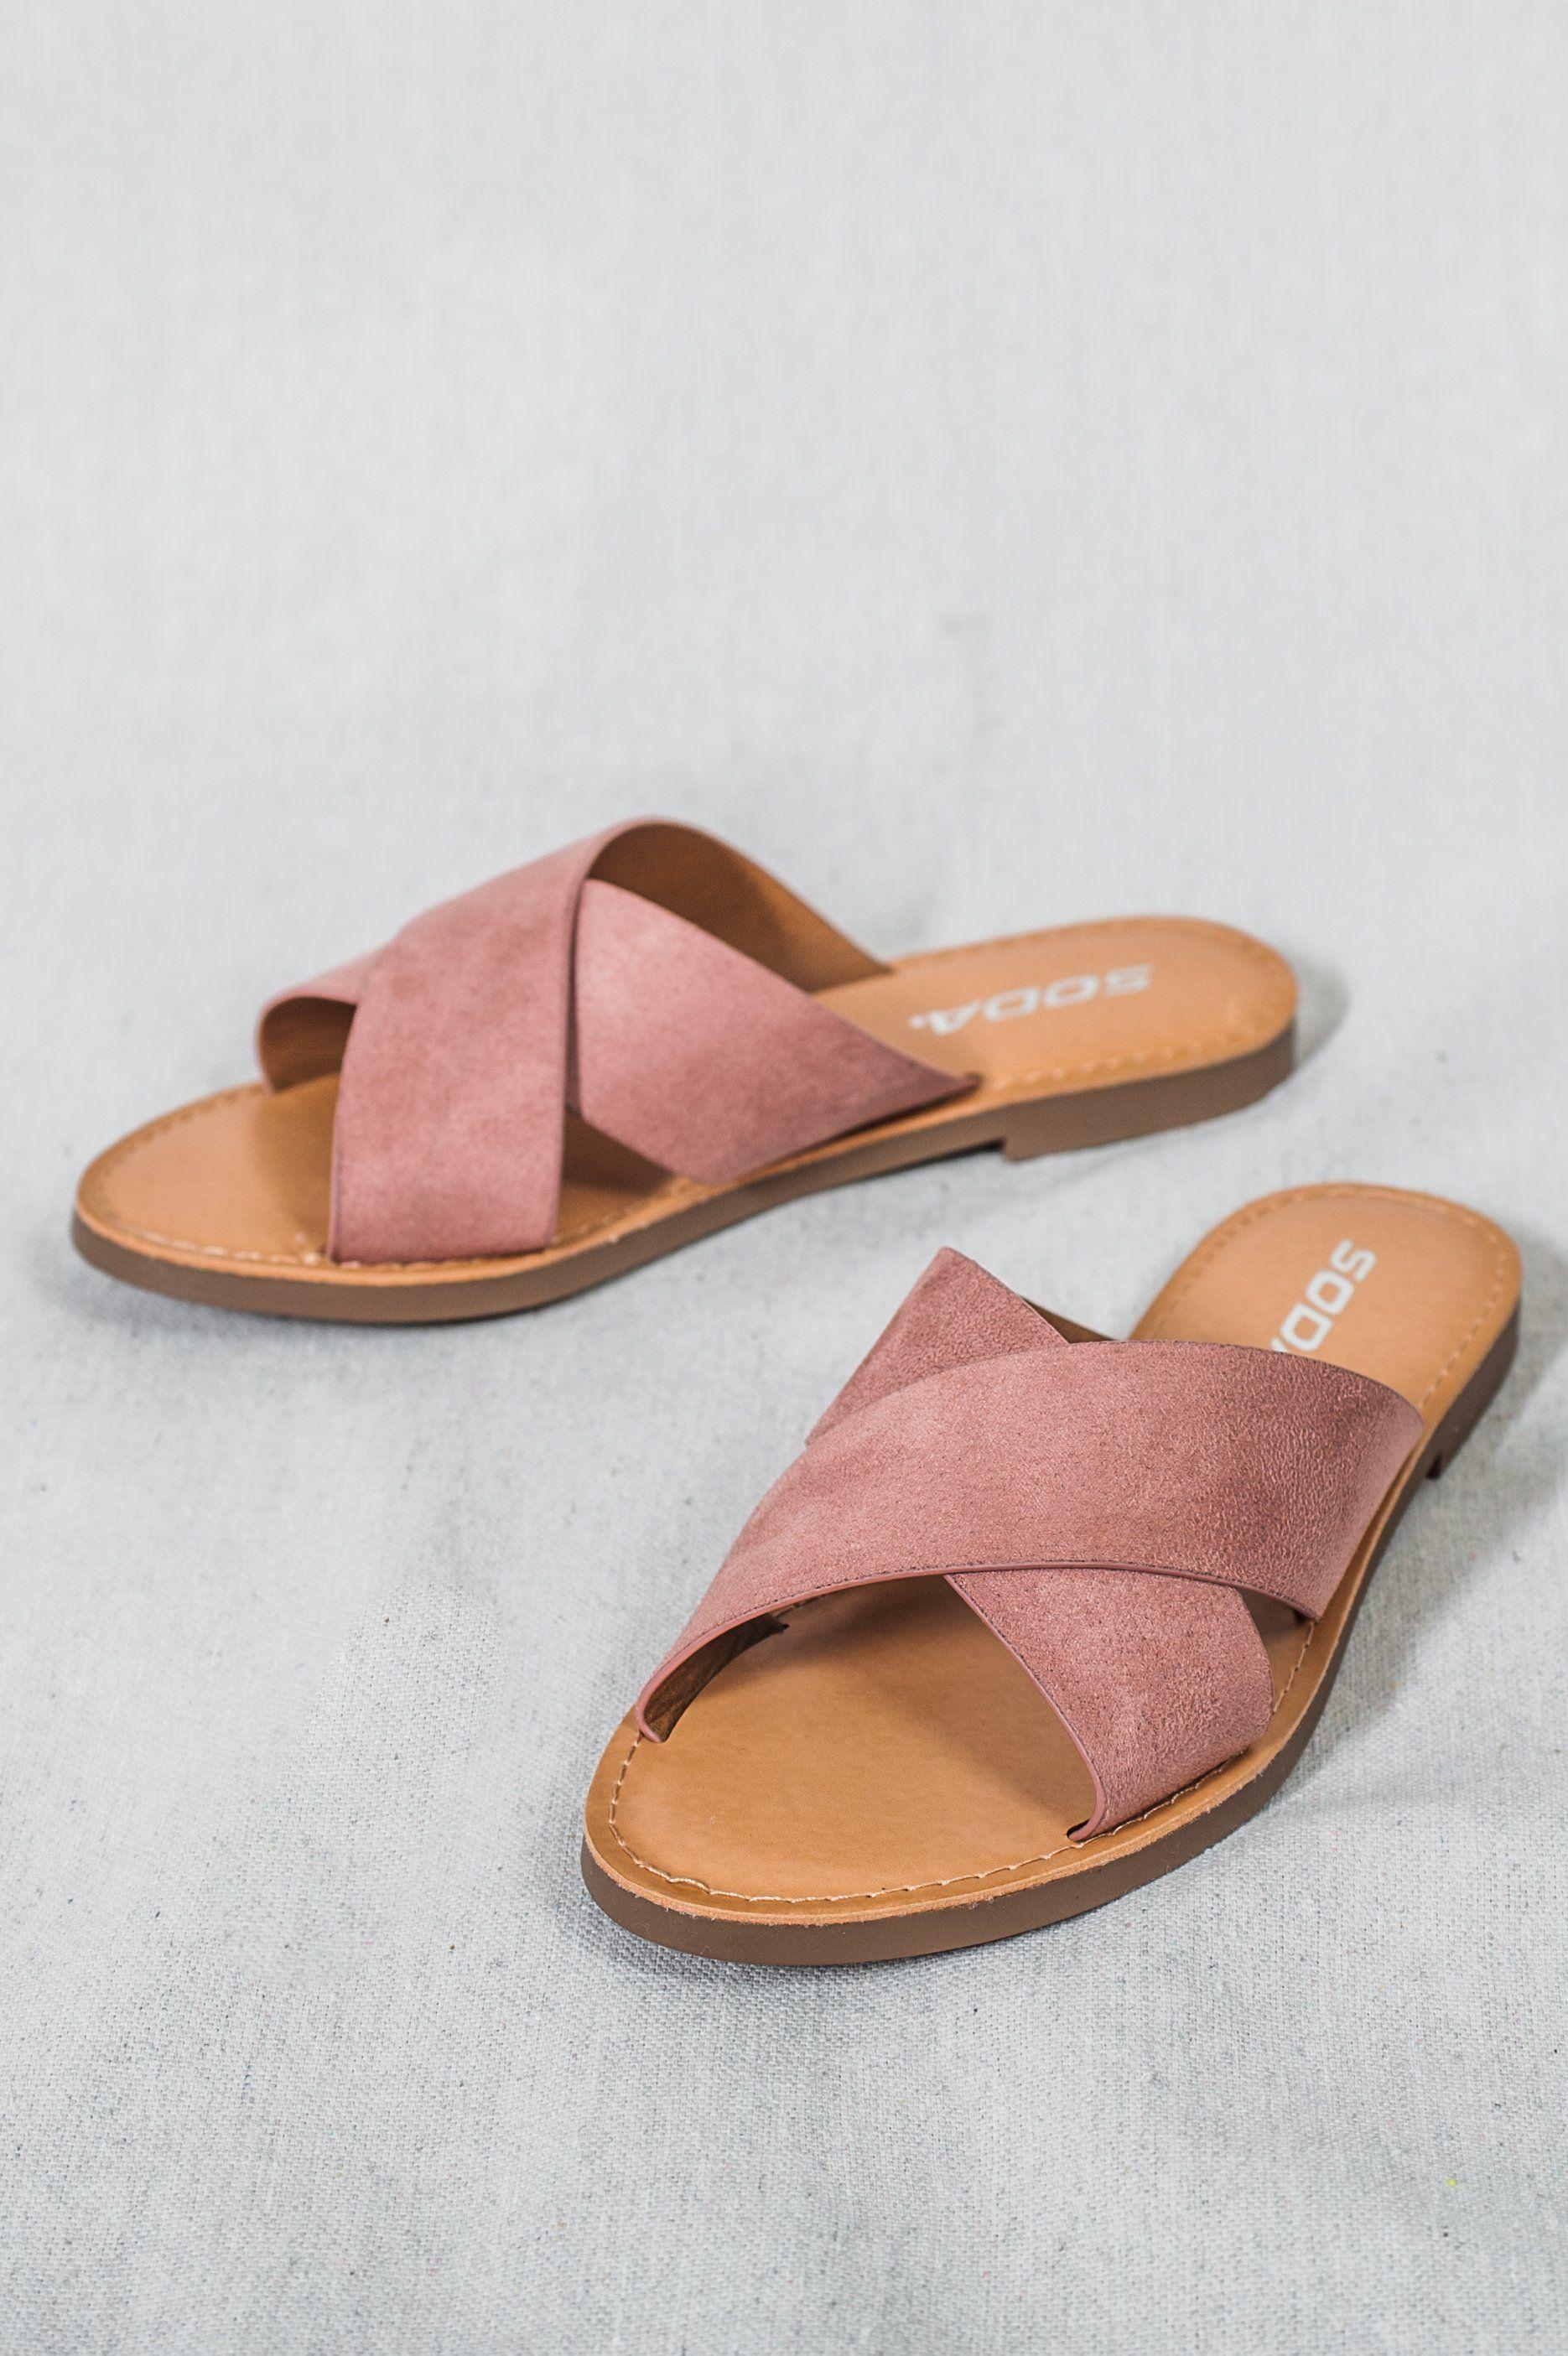 e828843afe7a9 Walk in Madrid Sandal -Women's Tan Crossover Sandals, Women's Soda Brand Criss  Cross Tan Leather Sandals, Women's Tan Leather Sandals, Leather Sandals for  ...